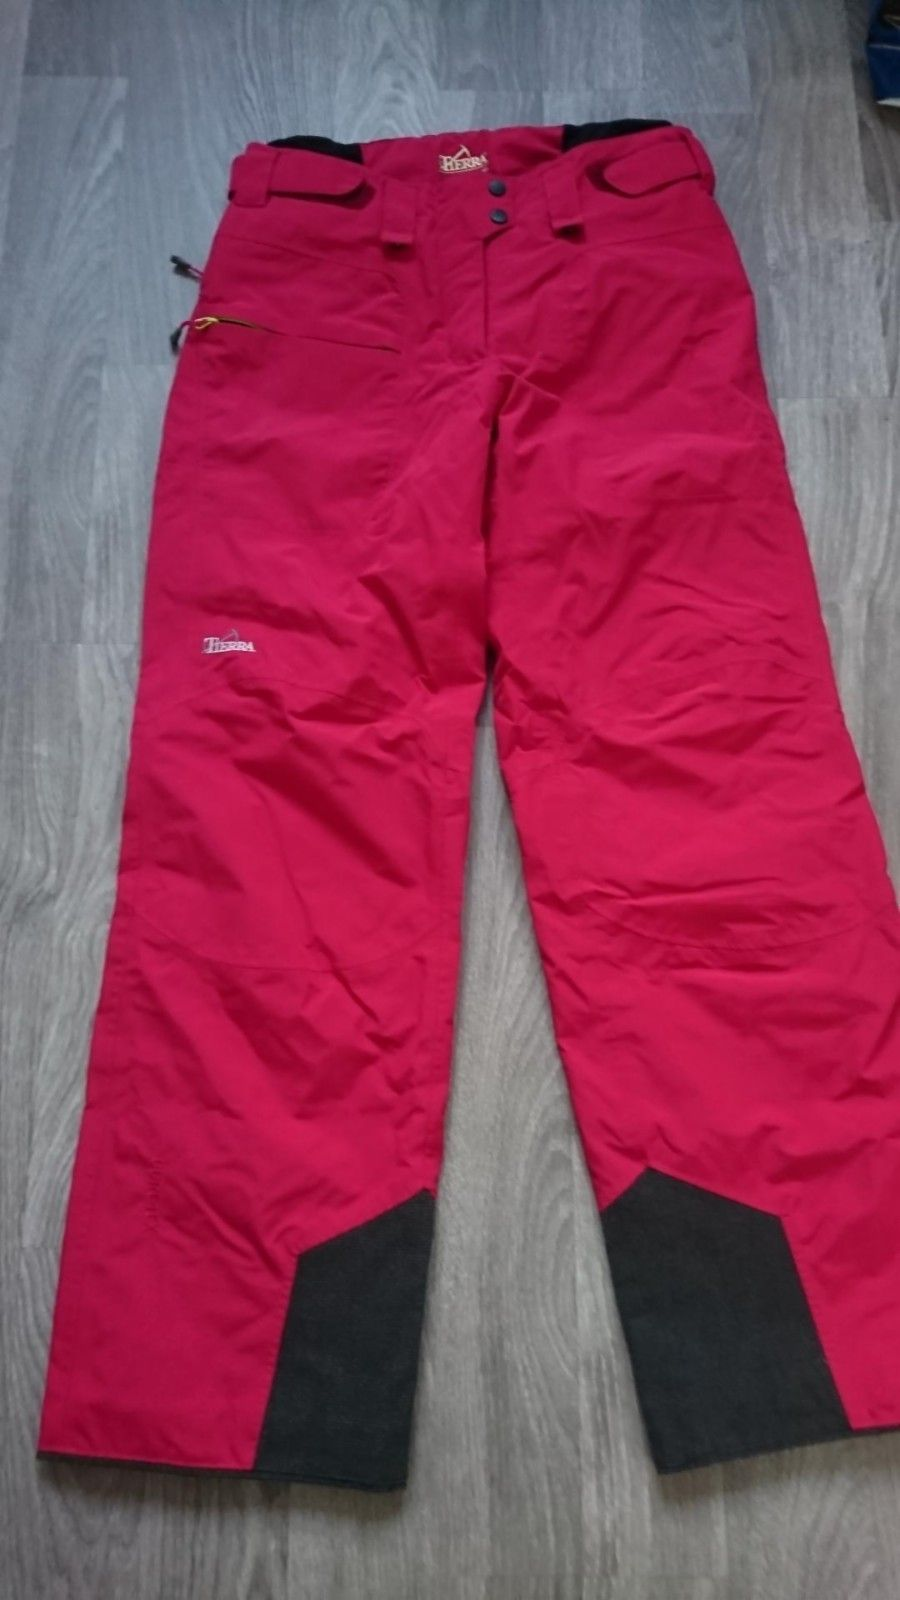 Norrøna Narvik Gore Tex 2L W str S, jakke og bukse, NY kun